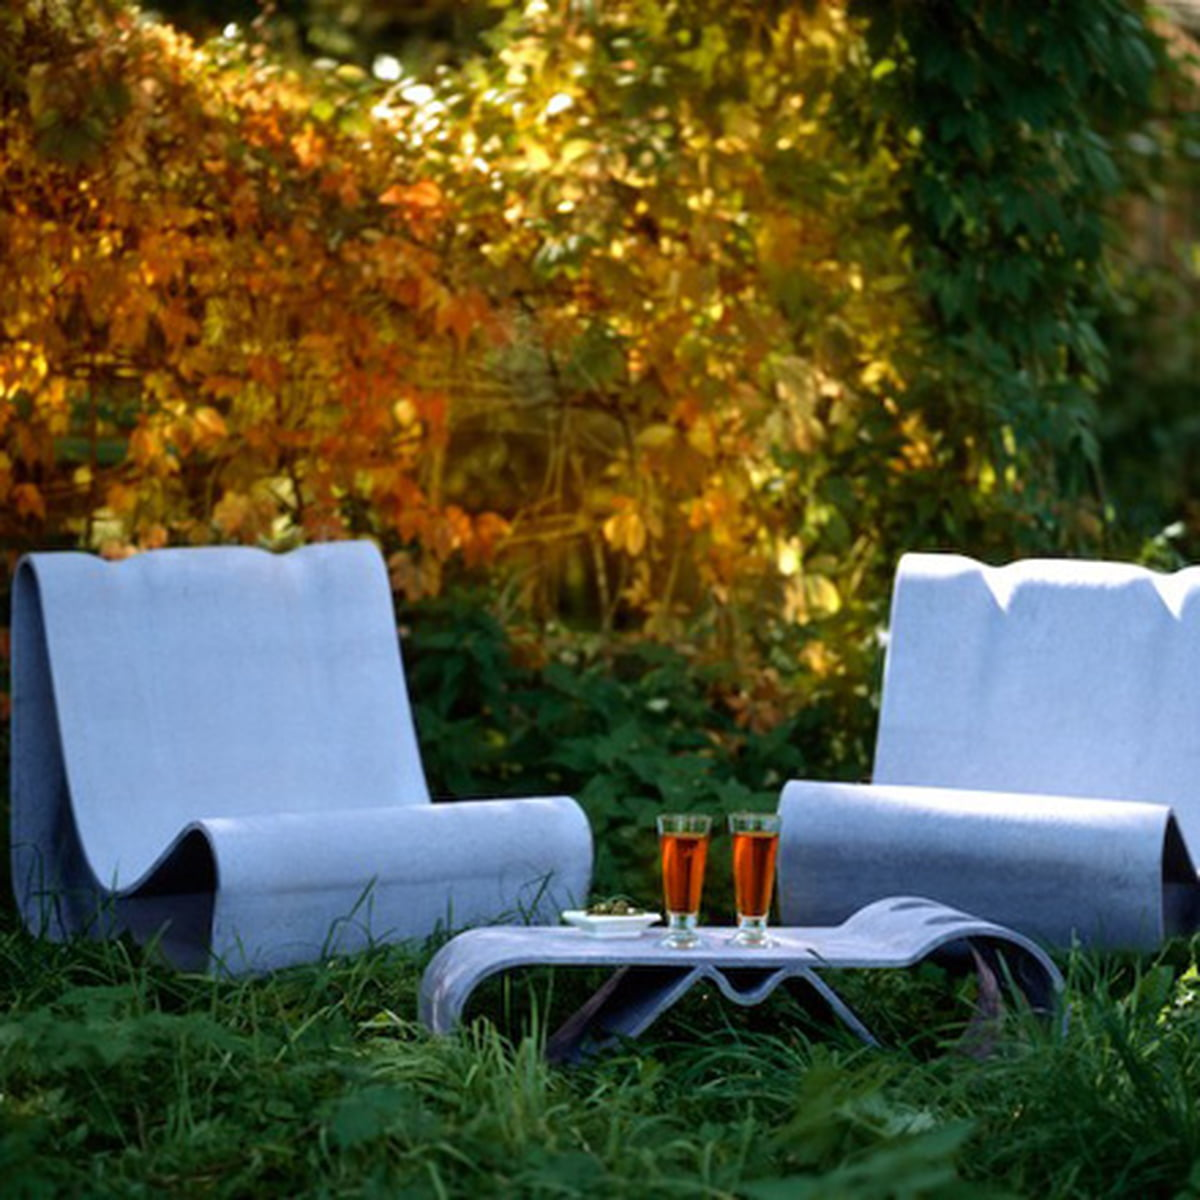 willy guhl loop outdoor sessel von eternit. Black Bedroom Furniture Sets. Home Design Ideas